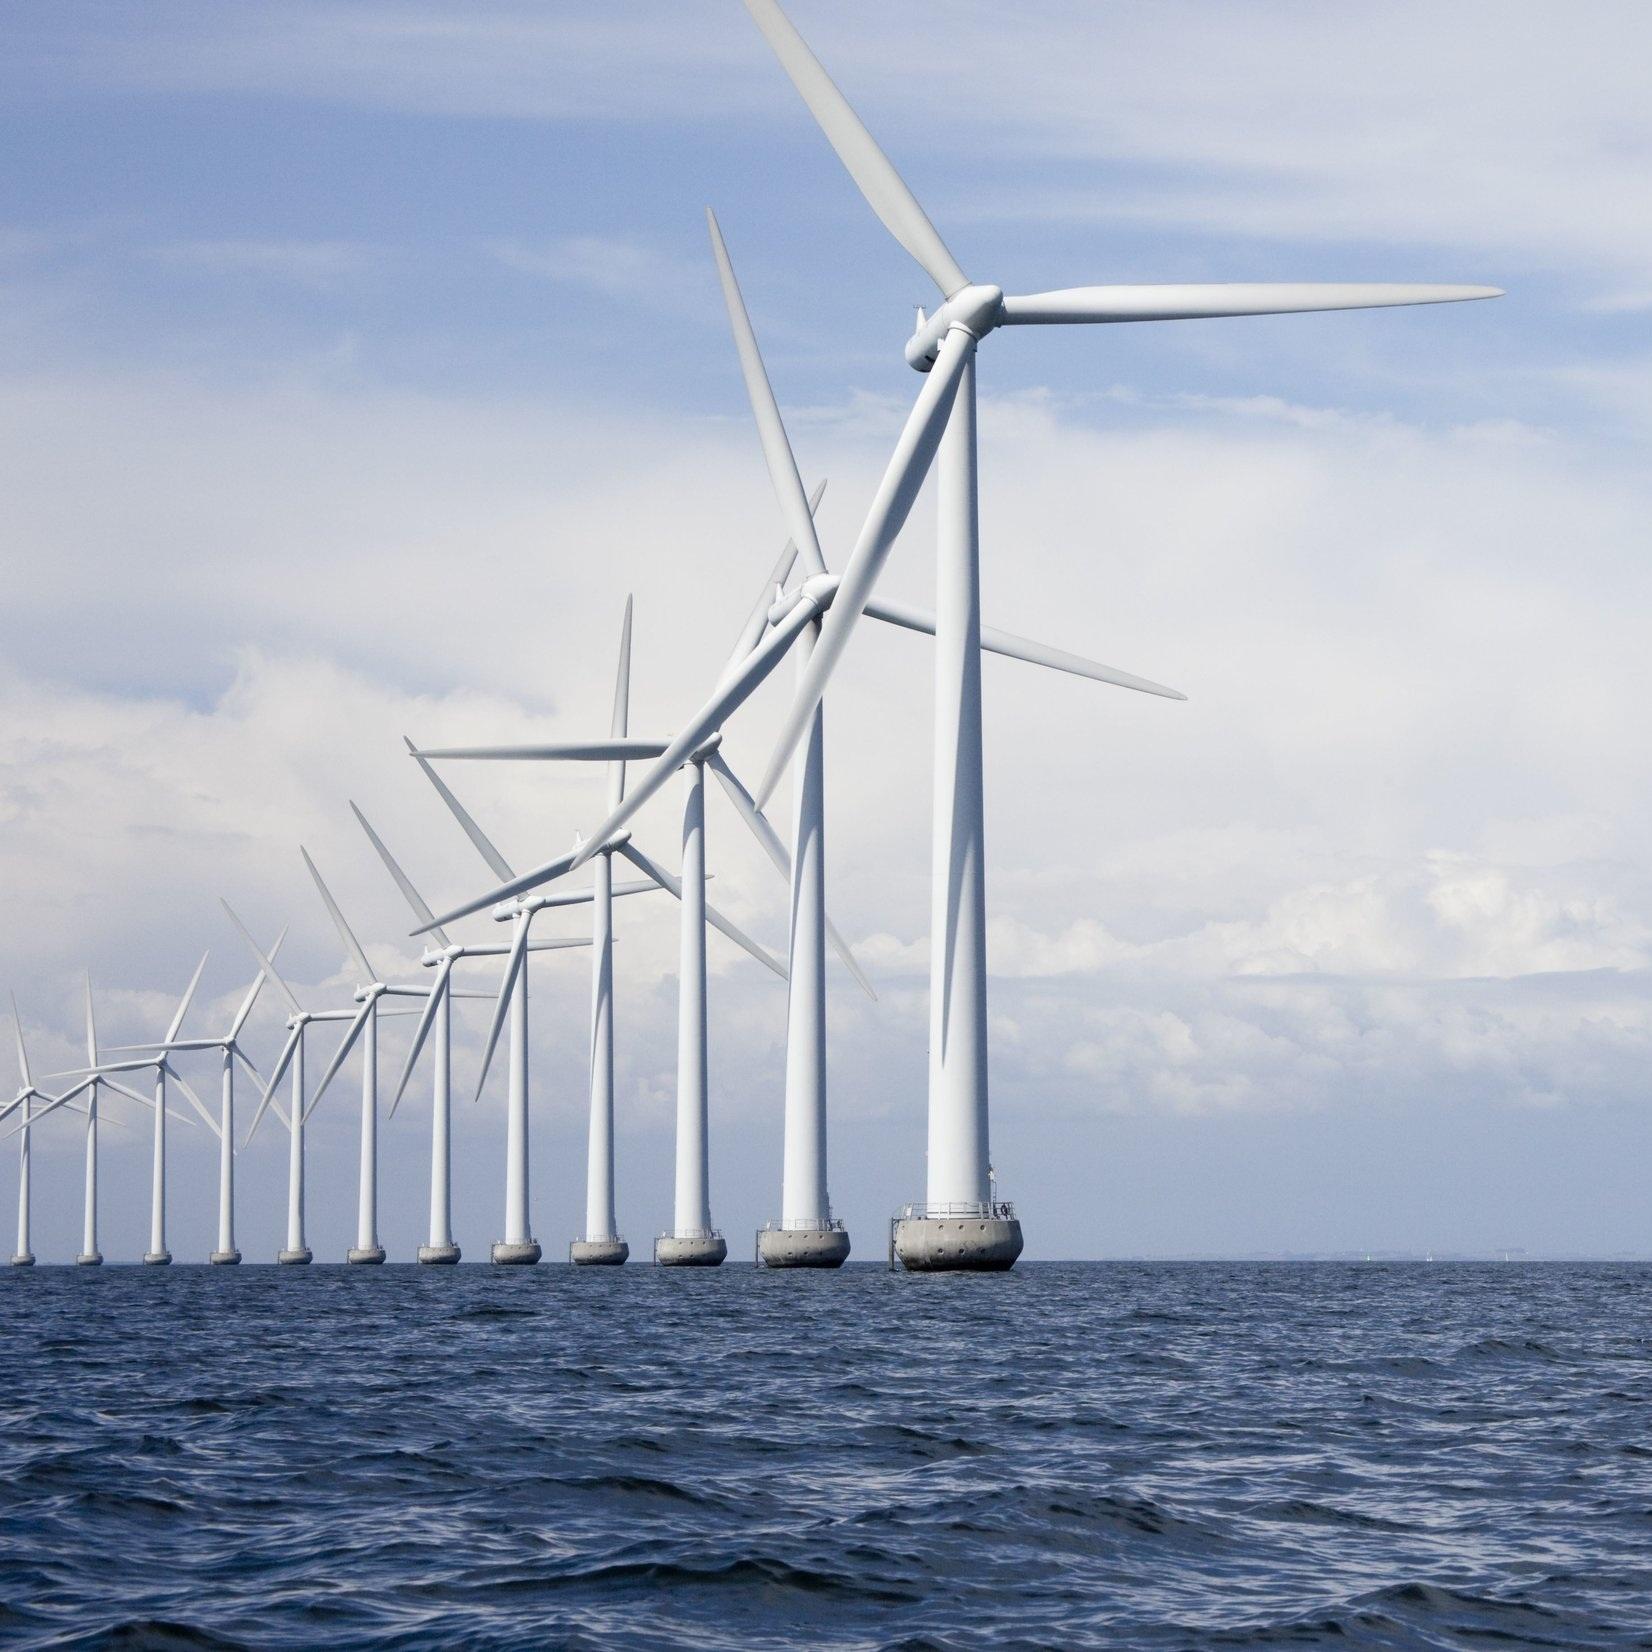 ….Unsere Windstärke: Unsere Erfahrung aus über 350 erfolgreichen Projekten..Our wind strength: Our experience from over 350 successful projects…. -